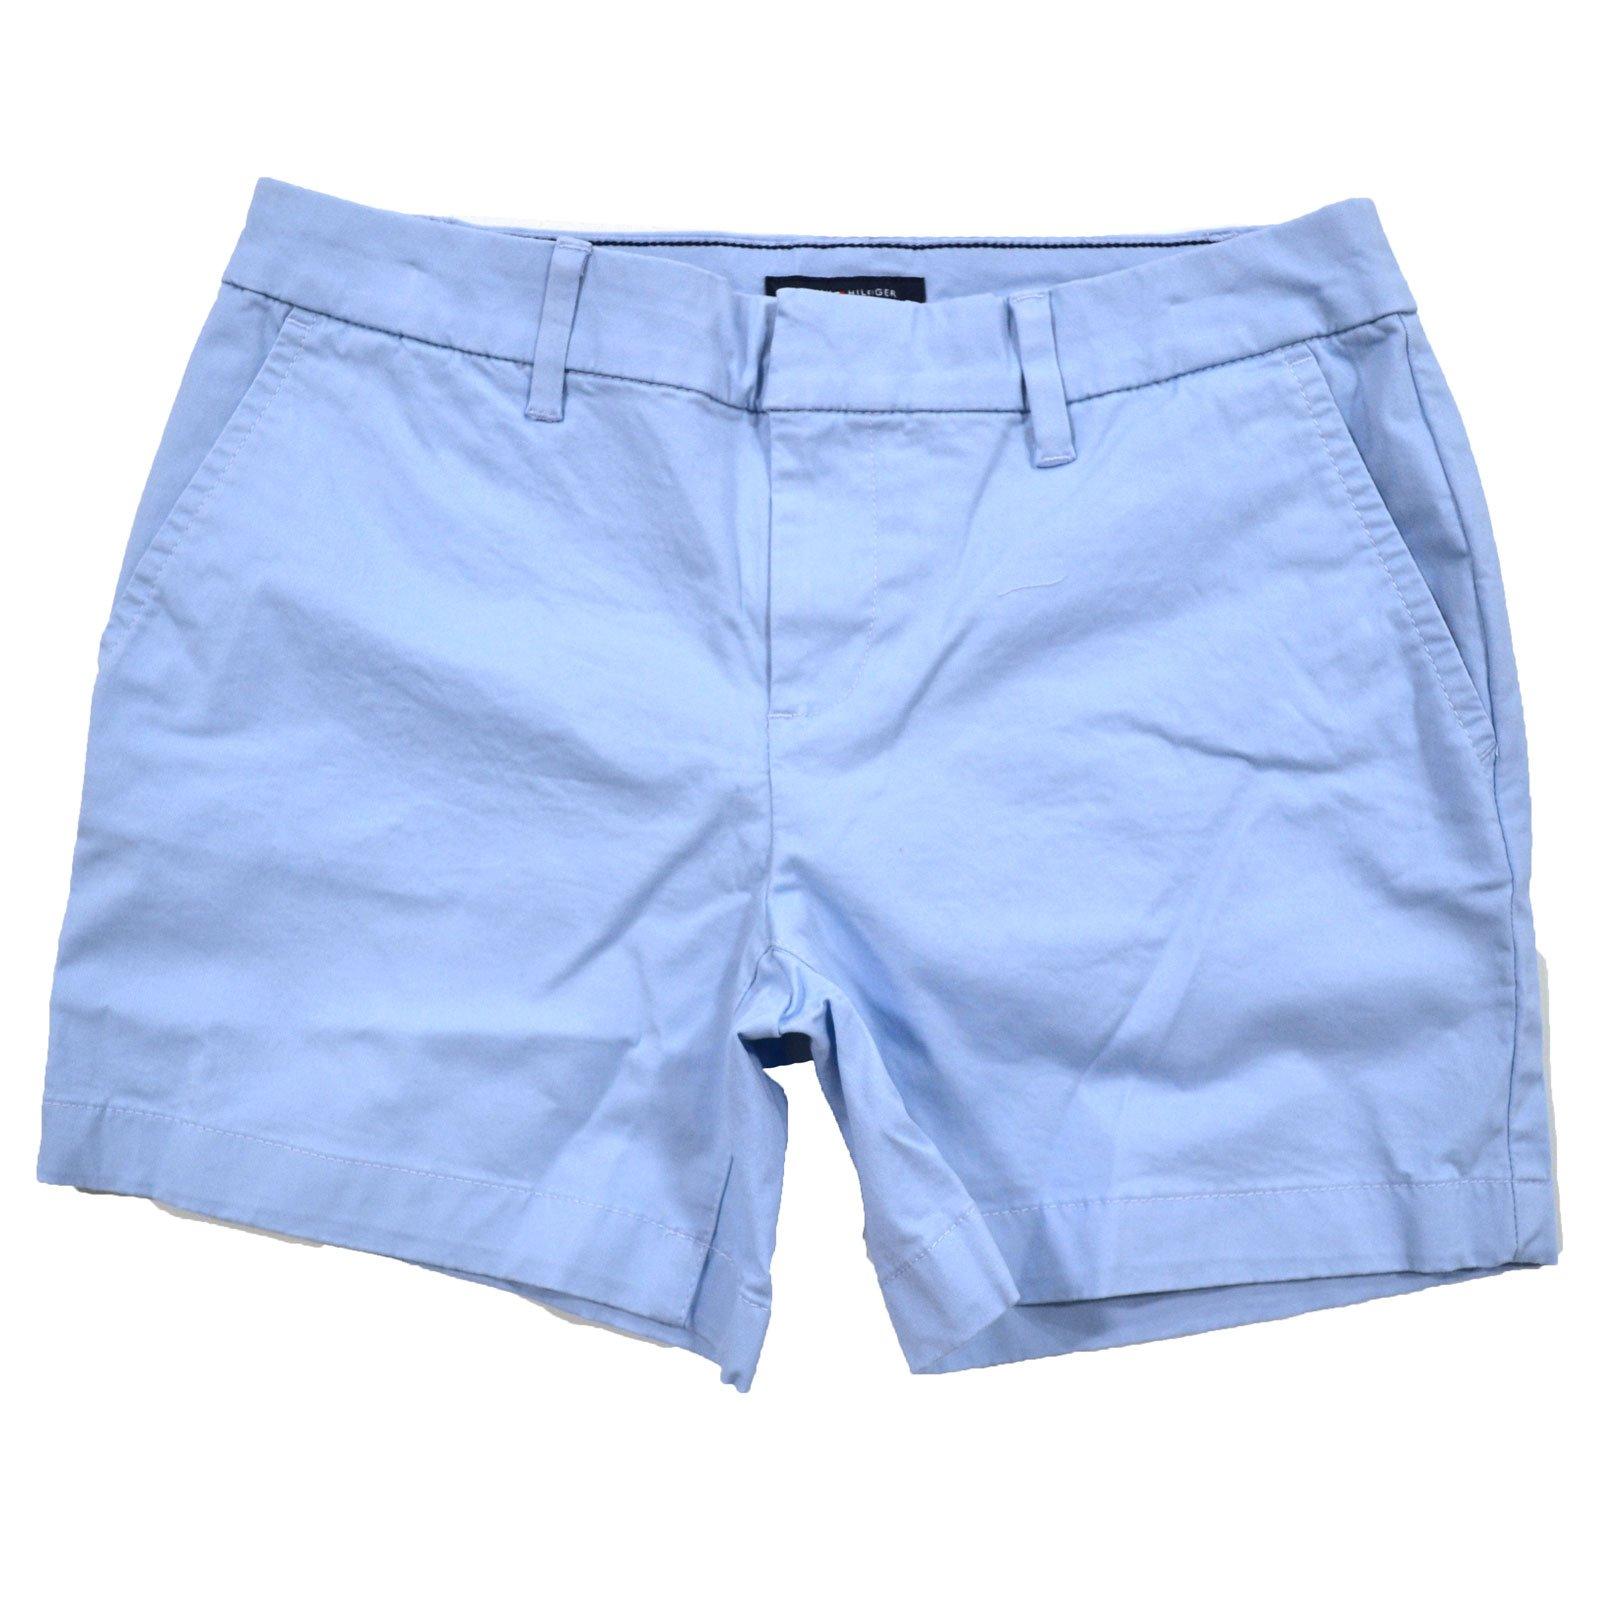 Tommy Hilfiger Womens Hollywood Shorts (14, Blue)